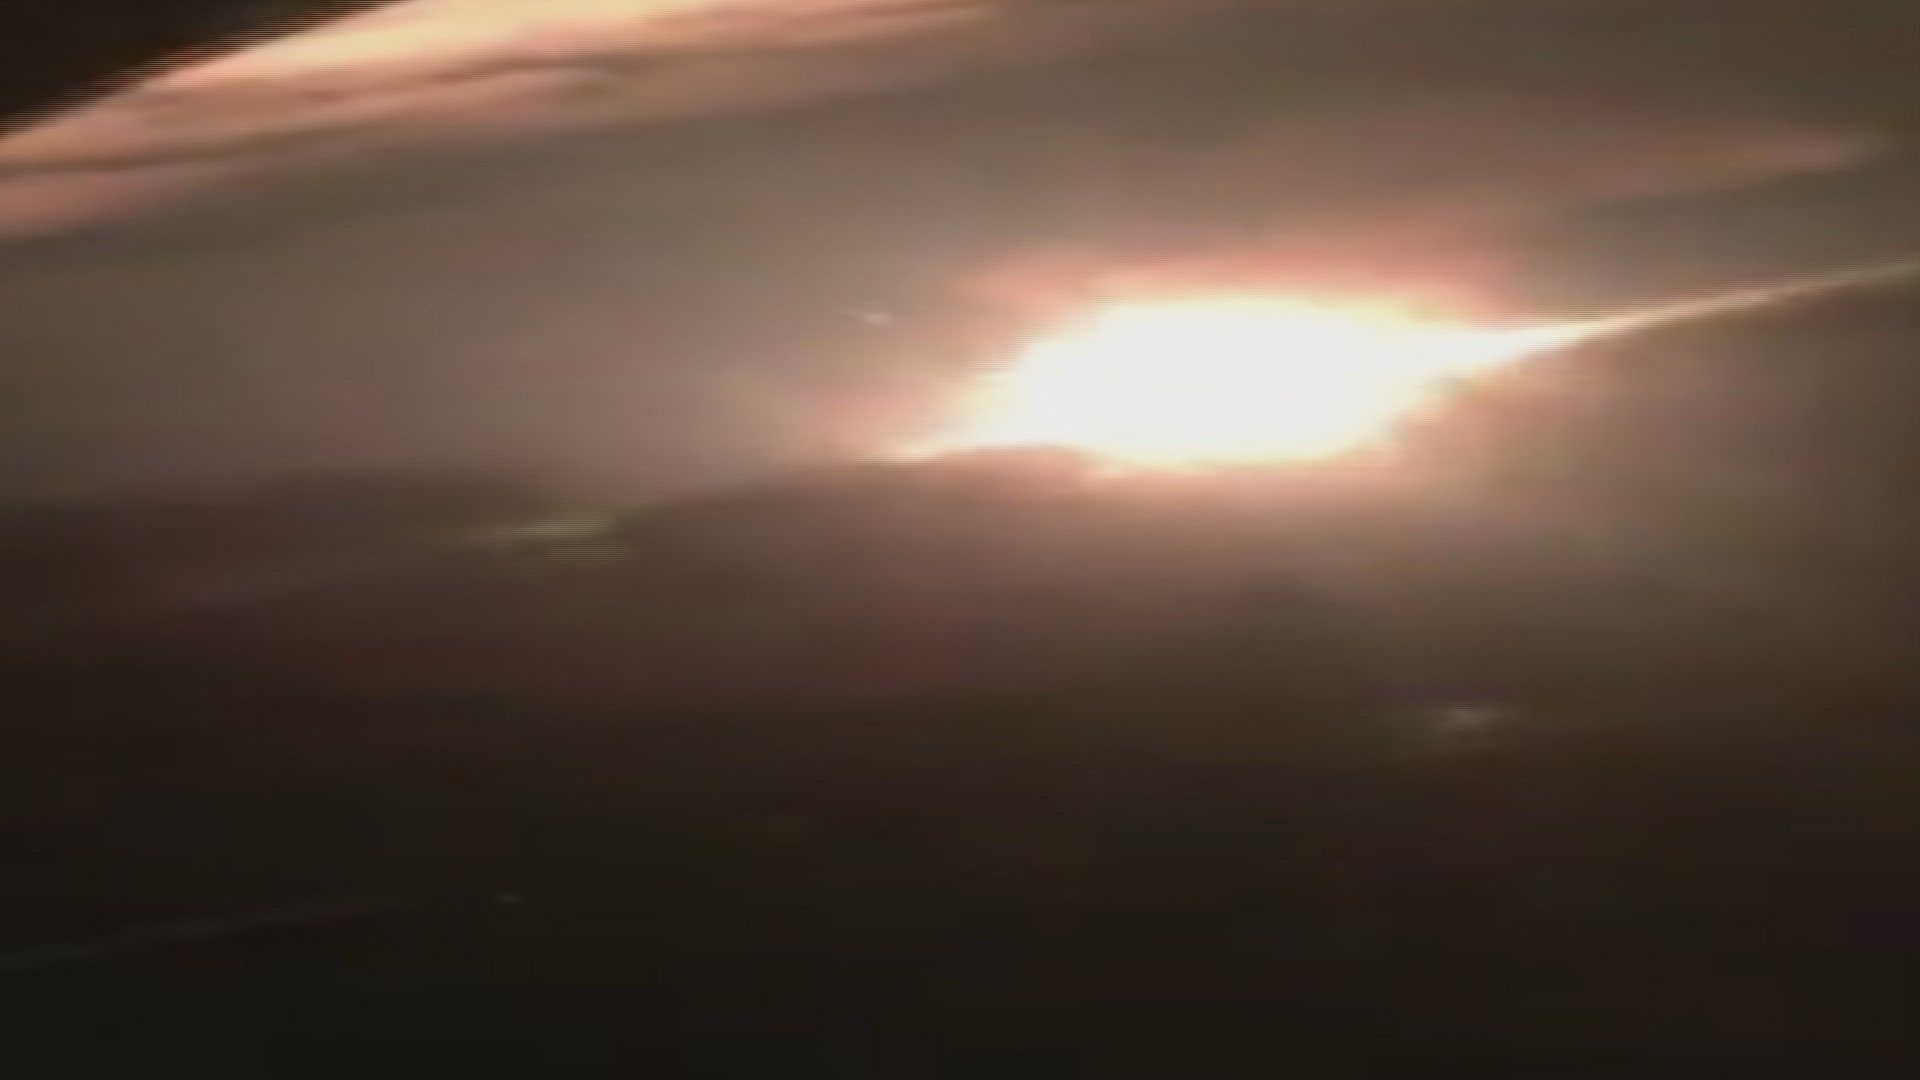 Pipeline explosion felt 60 miles away